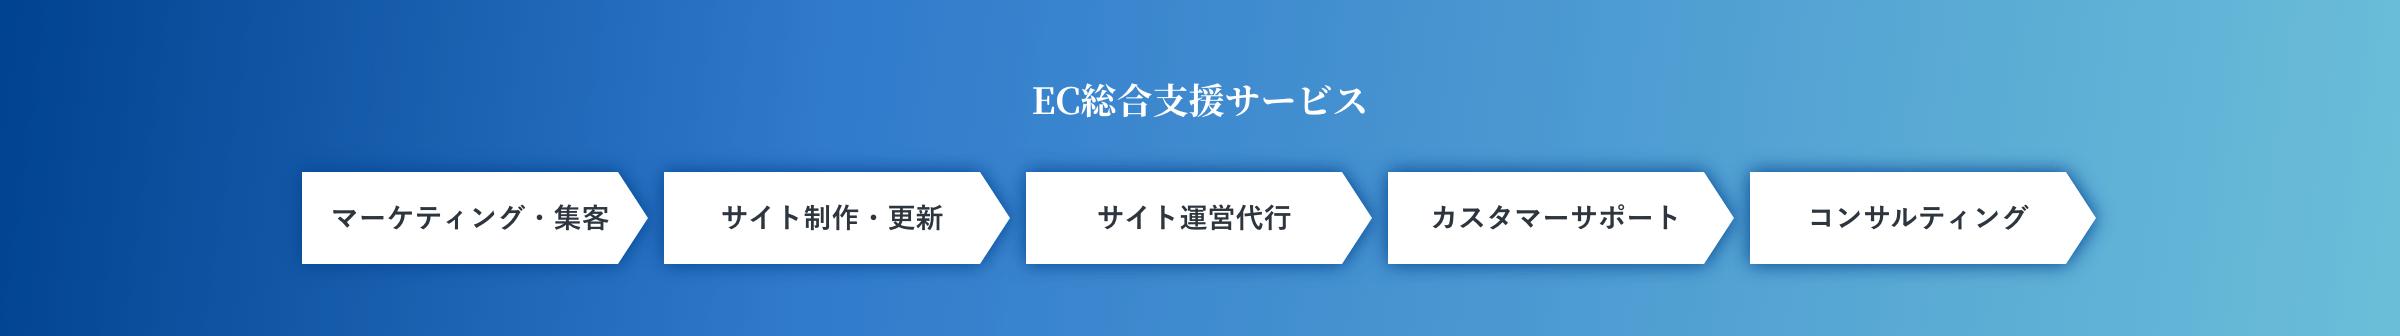 EC総合支援サービス マーケティング・集客 マーケティング・集客 サイト運営代行 カスタマーサポート コンサルティング